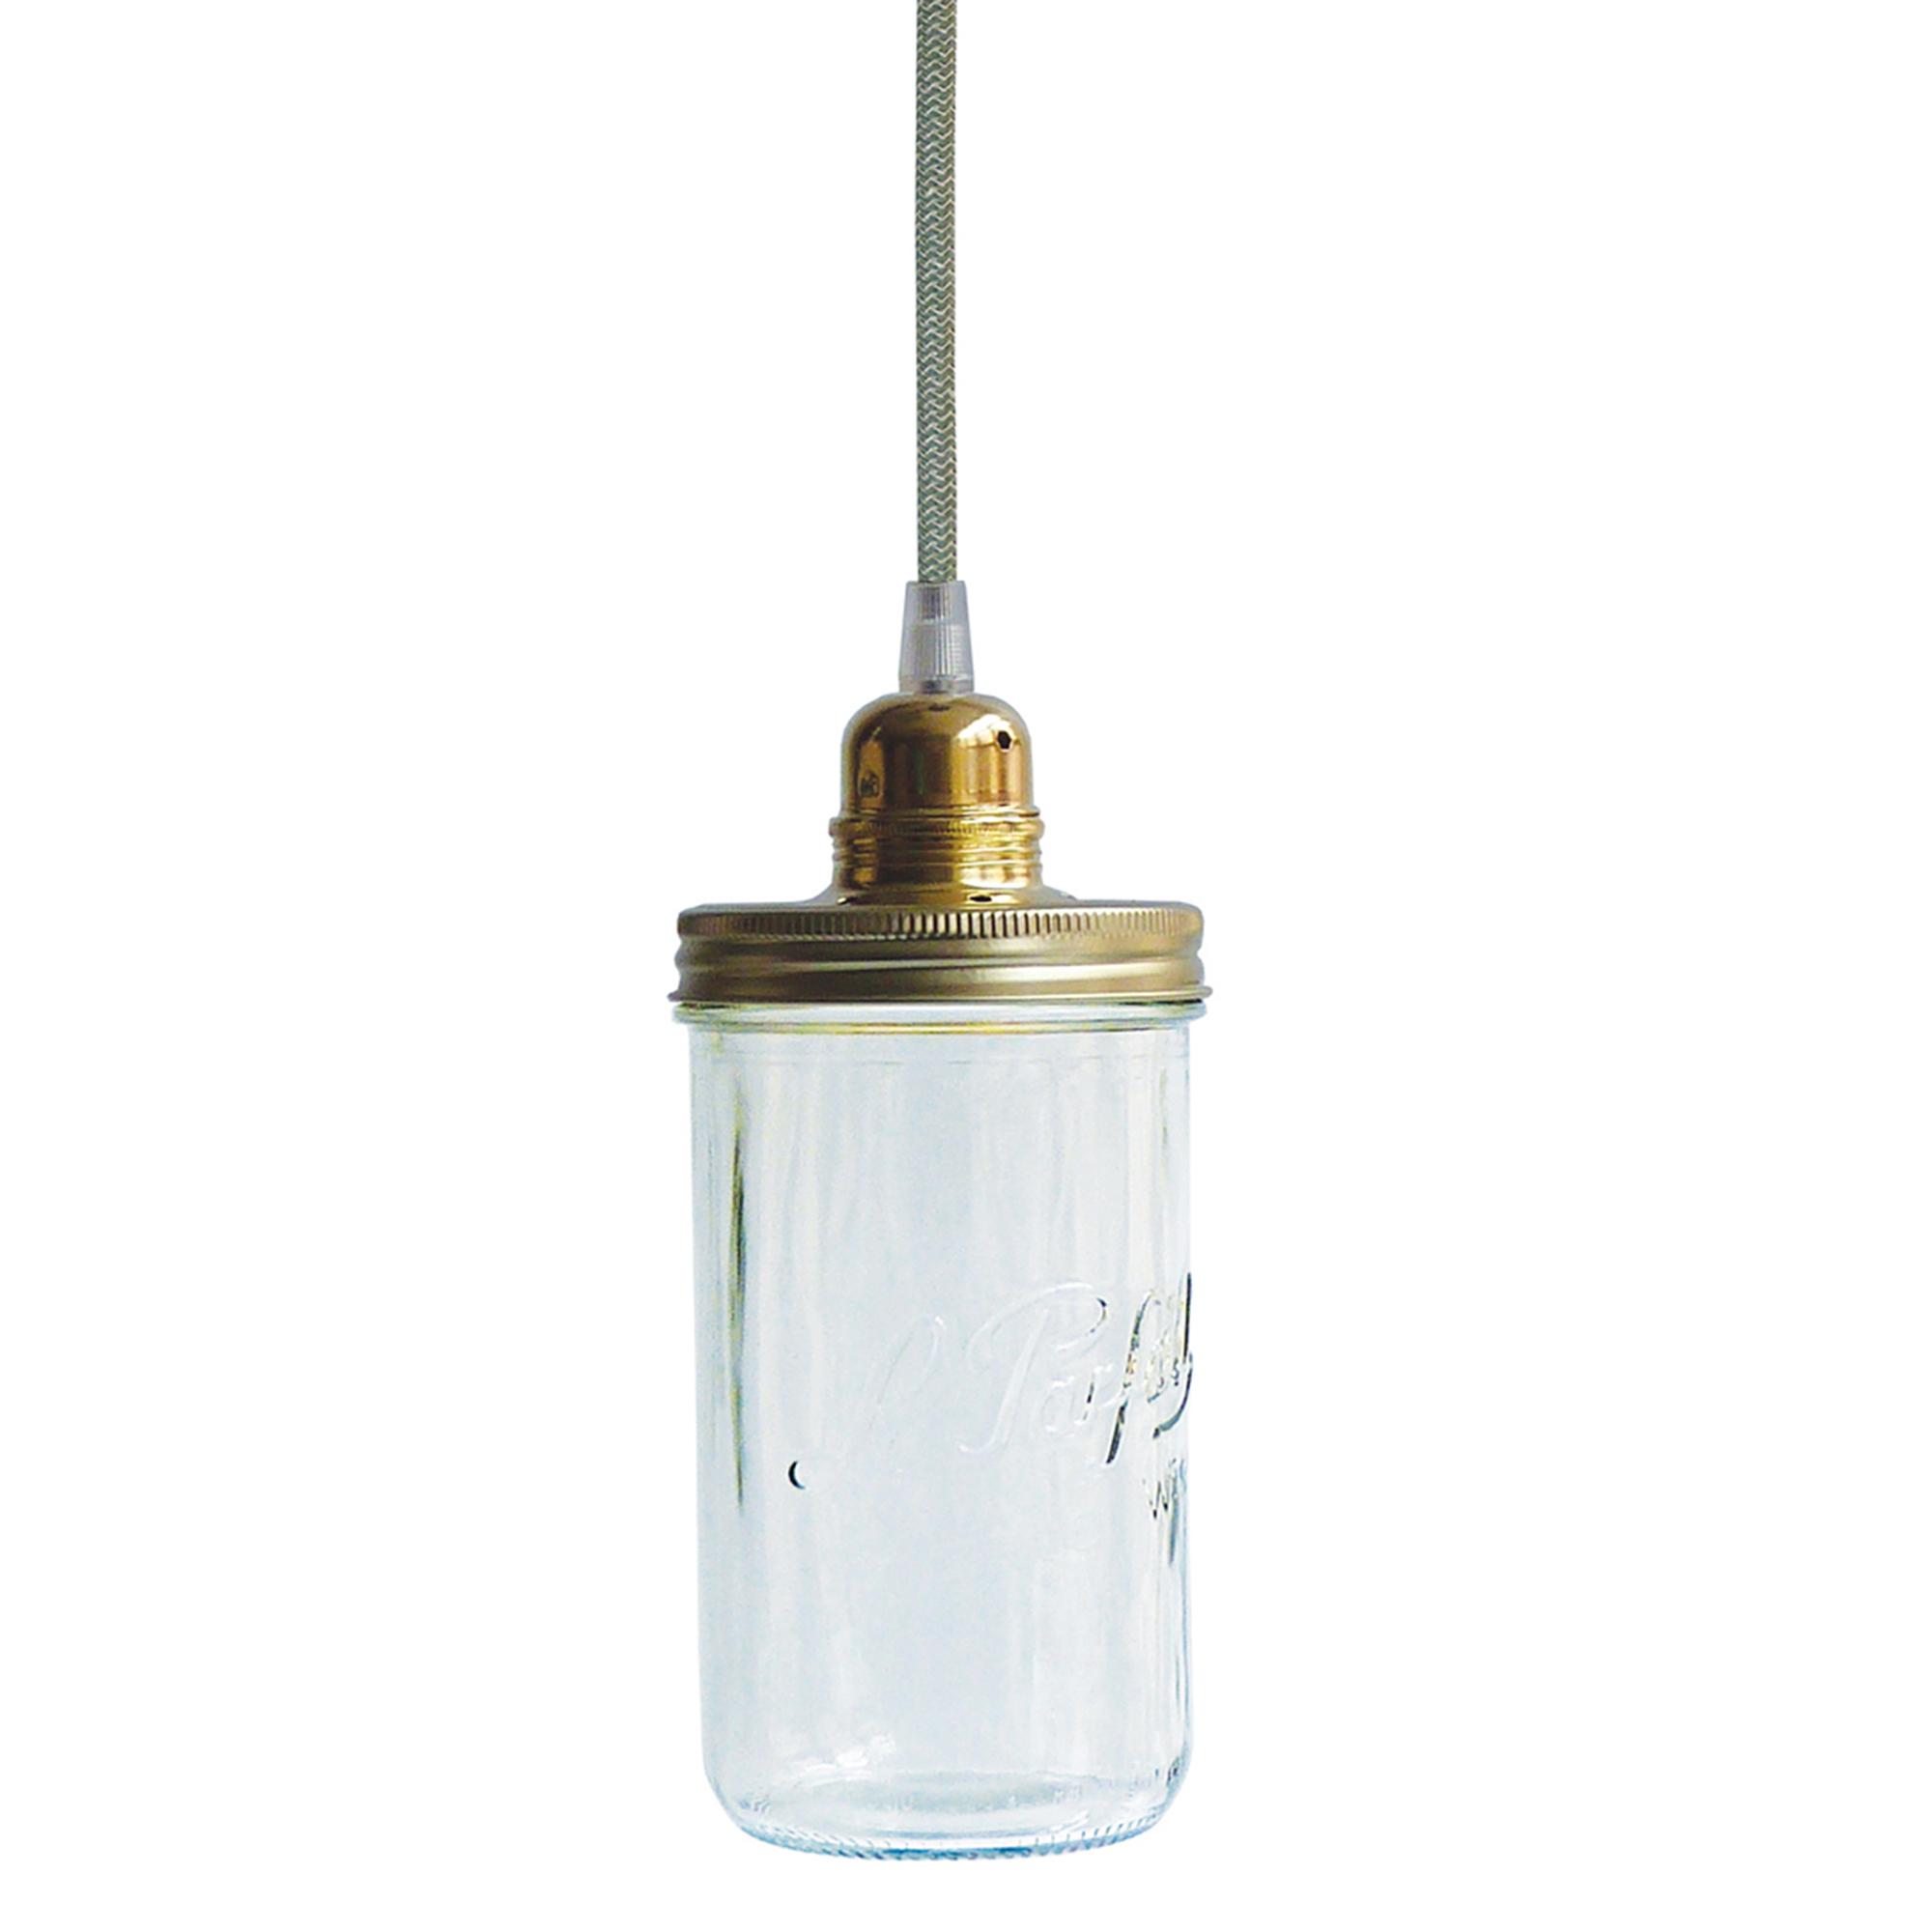 Dékolustre - Lustre bocal 1 tête fil vert